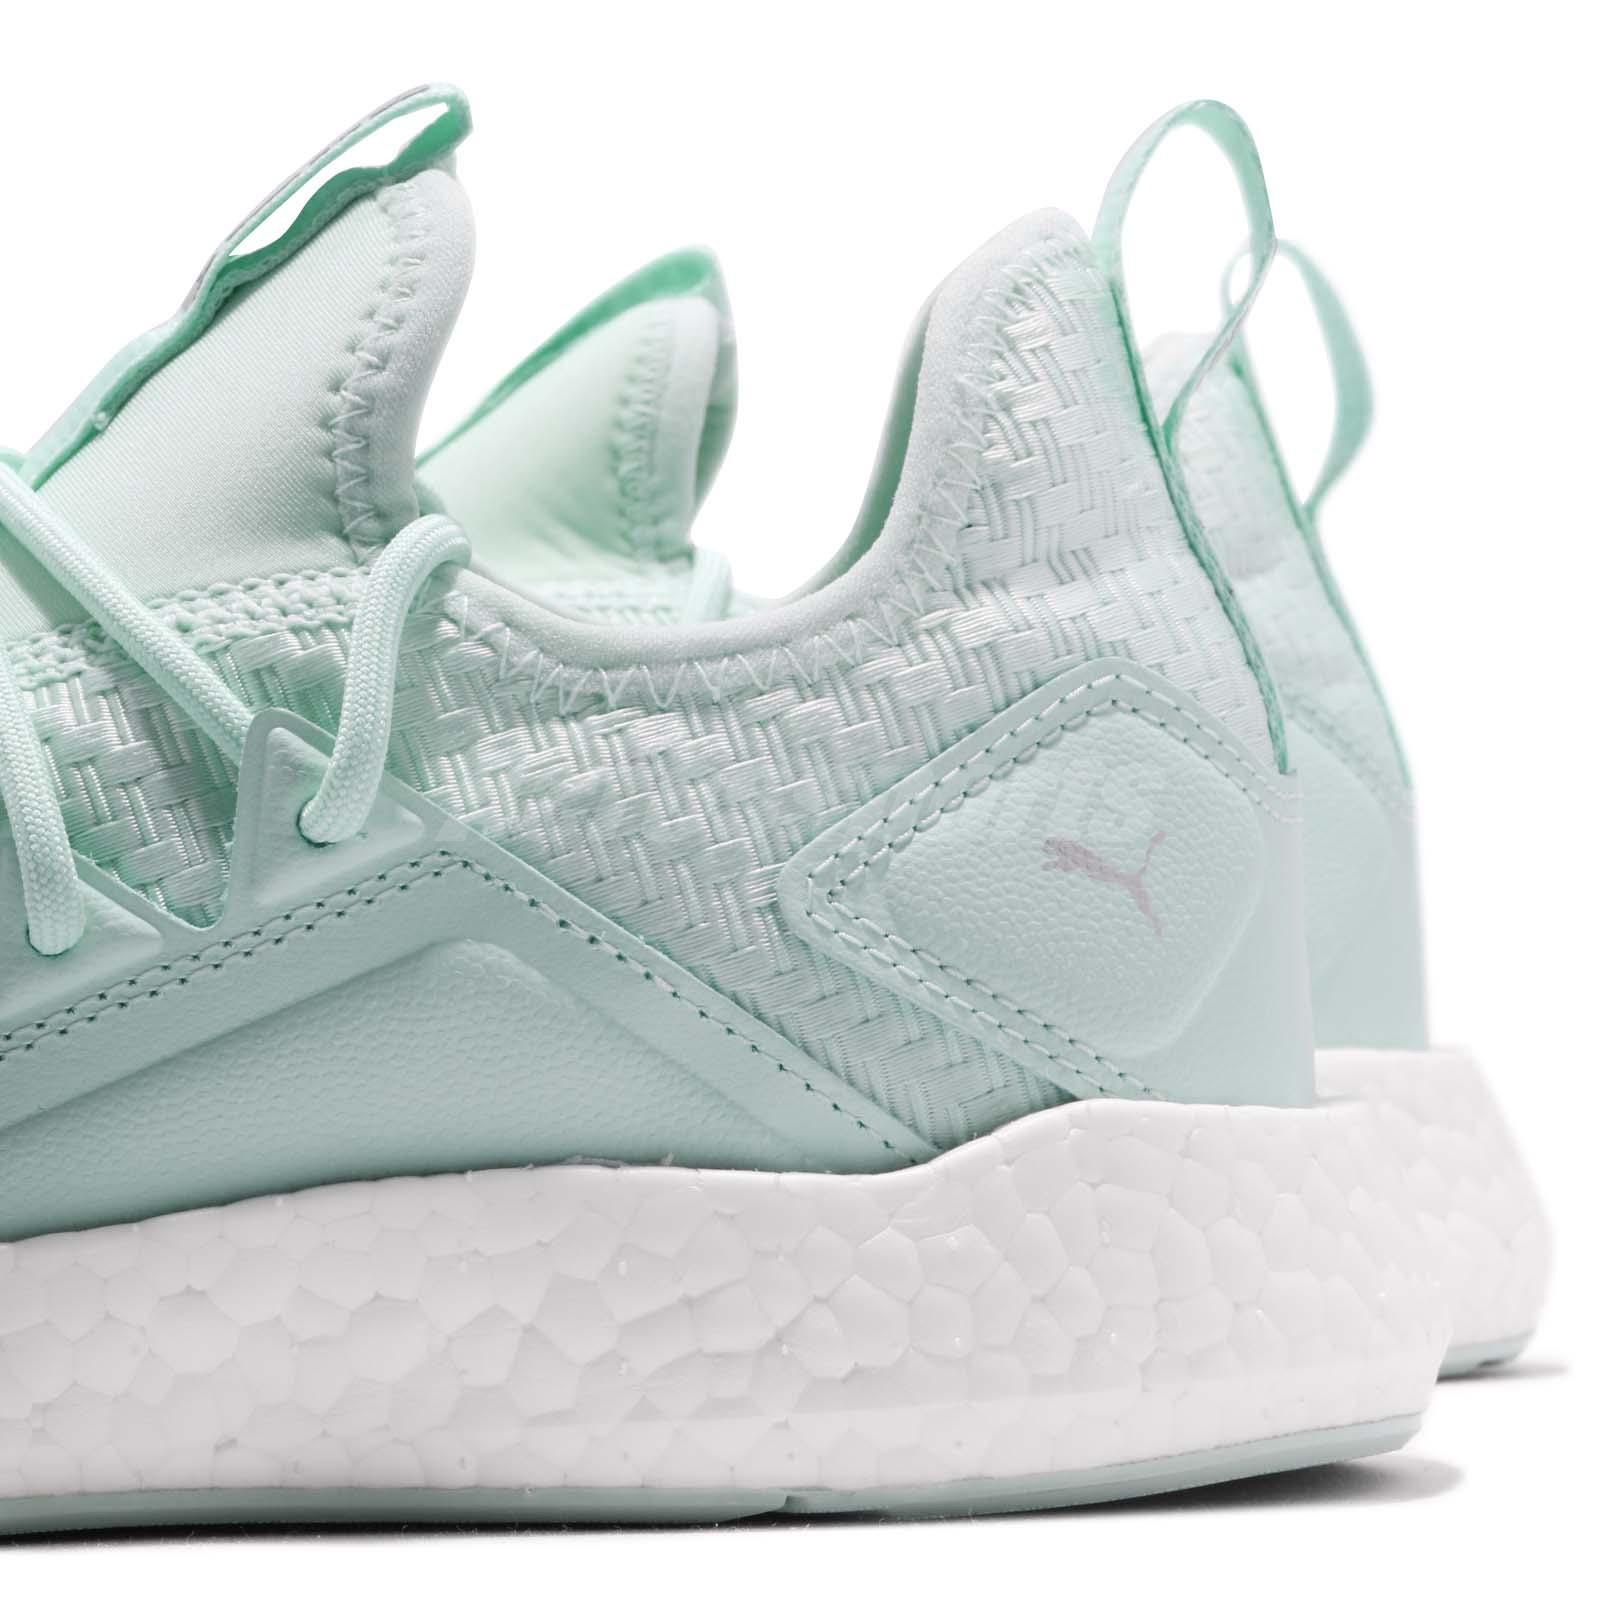 Puma NRGY Neko Cosmic Wns Fair Aqua White Women Running Shoes ... 37f30d17b